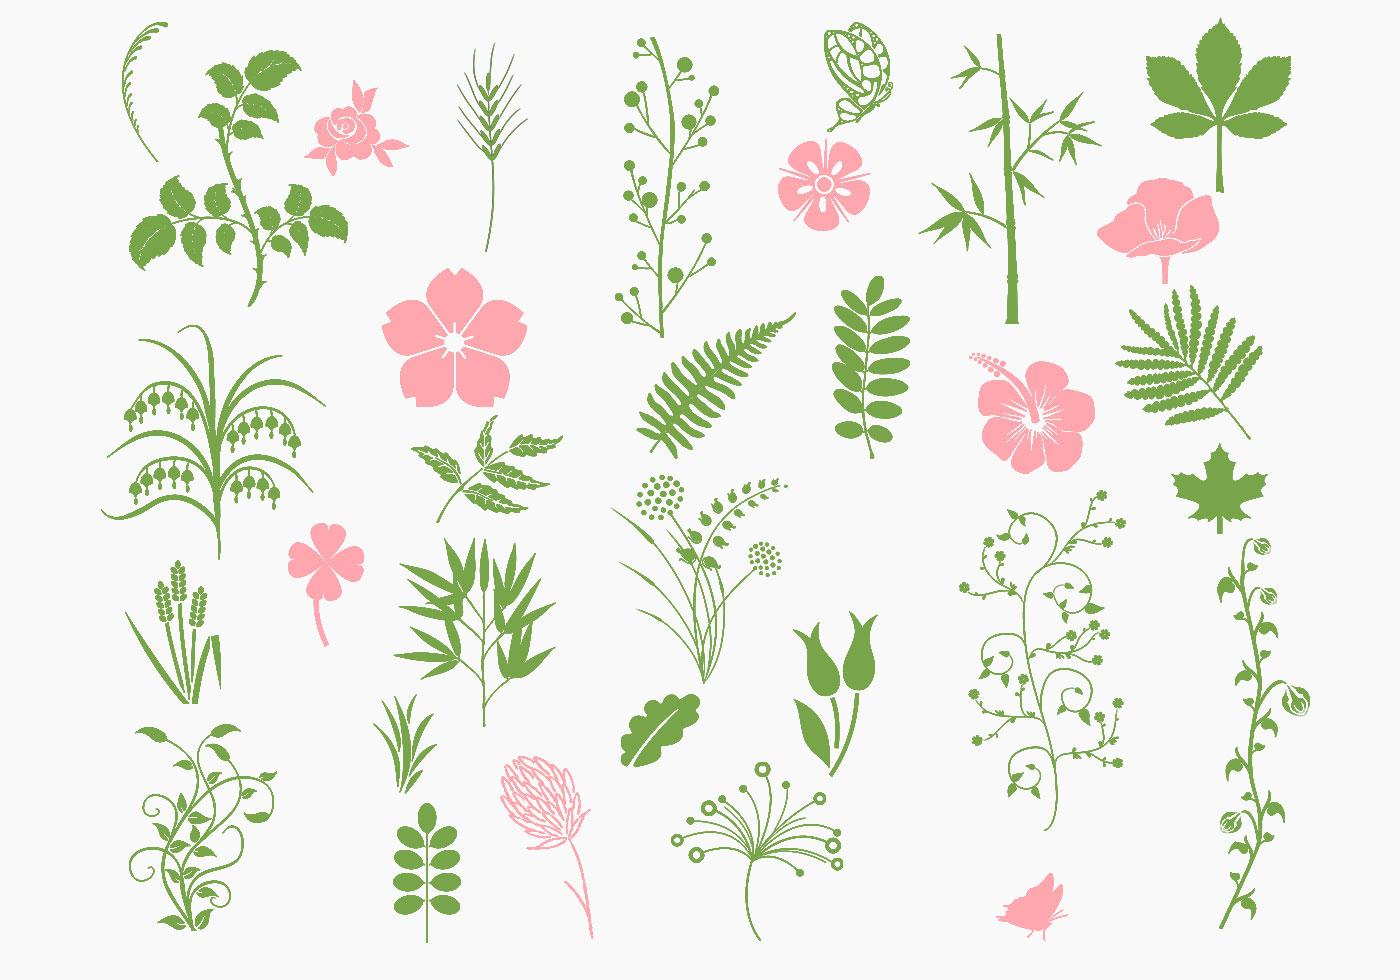 Pink And Green Organic Brush Pack Free Photoshop Brushes At Brusheezy